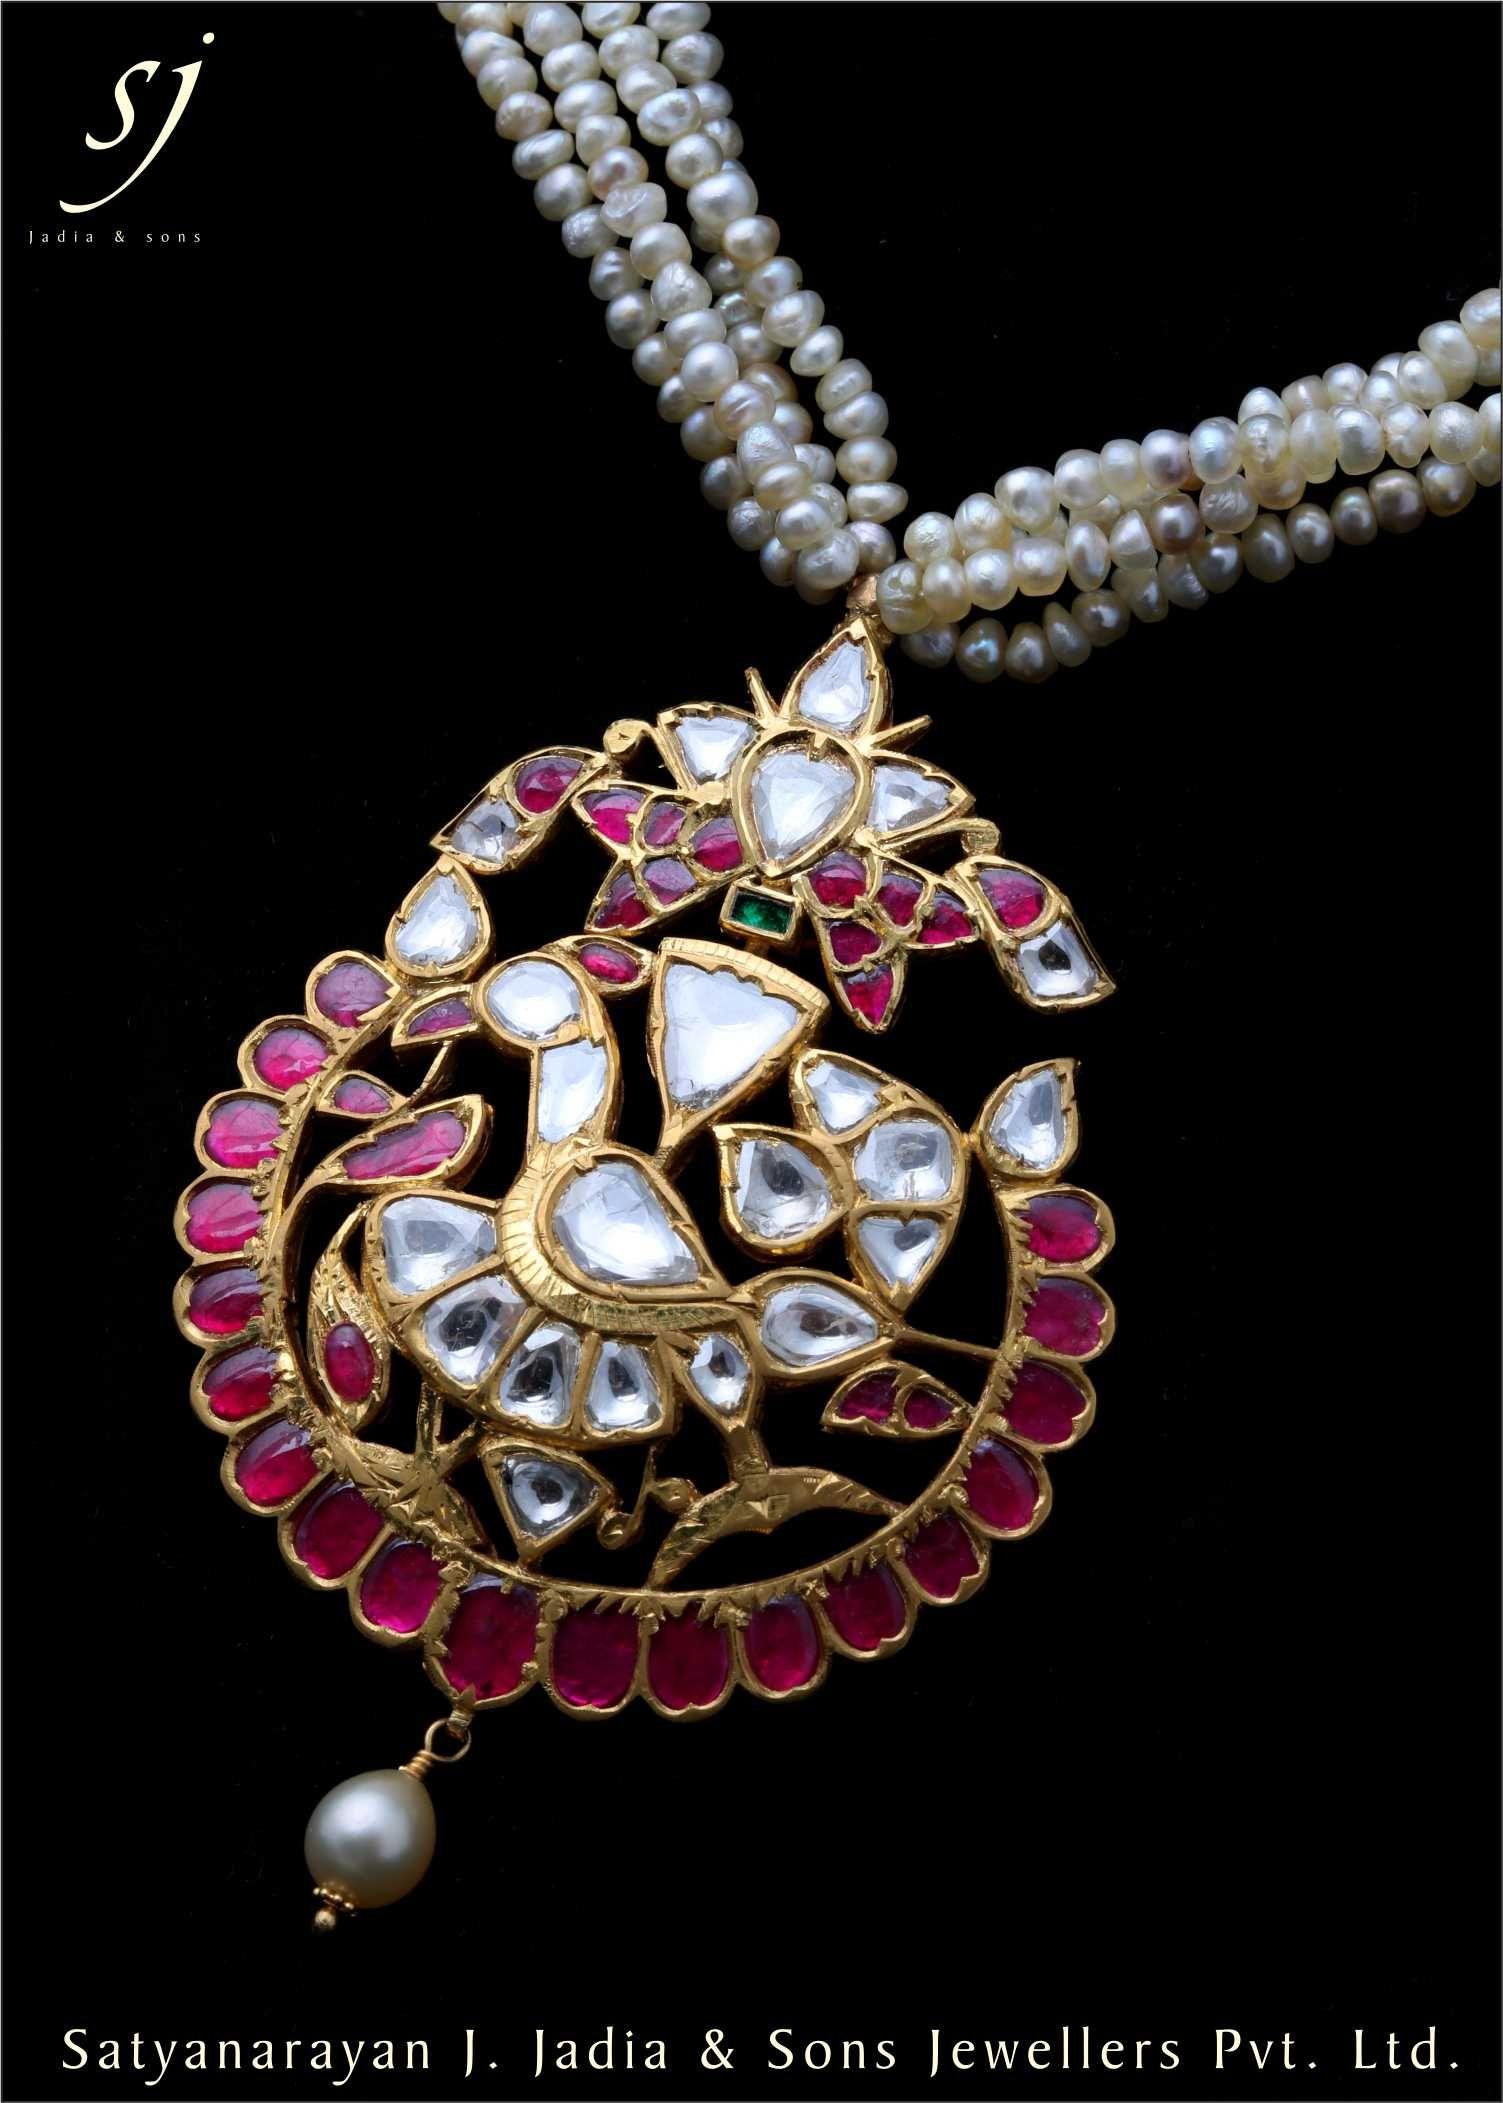 Pin by jayanthi selvan on design pinterest indian jewelry jewel